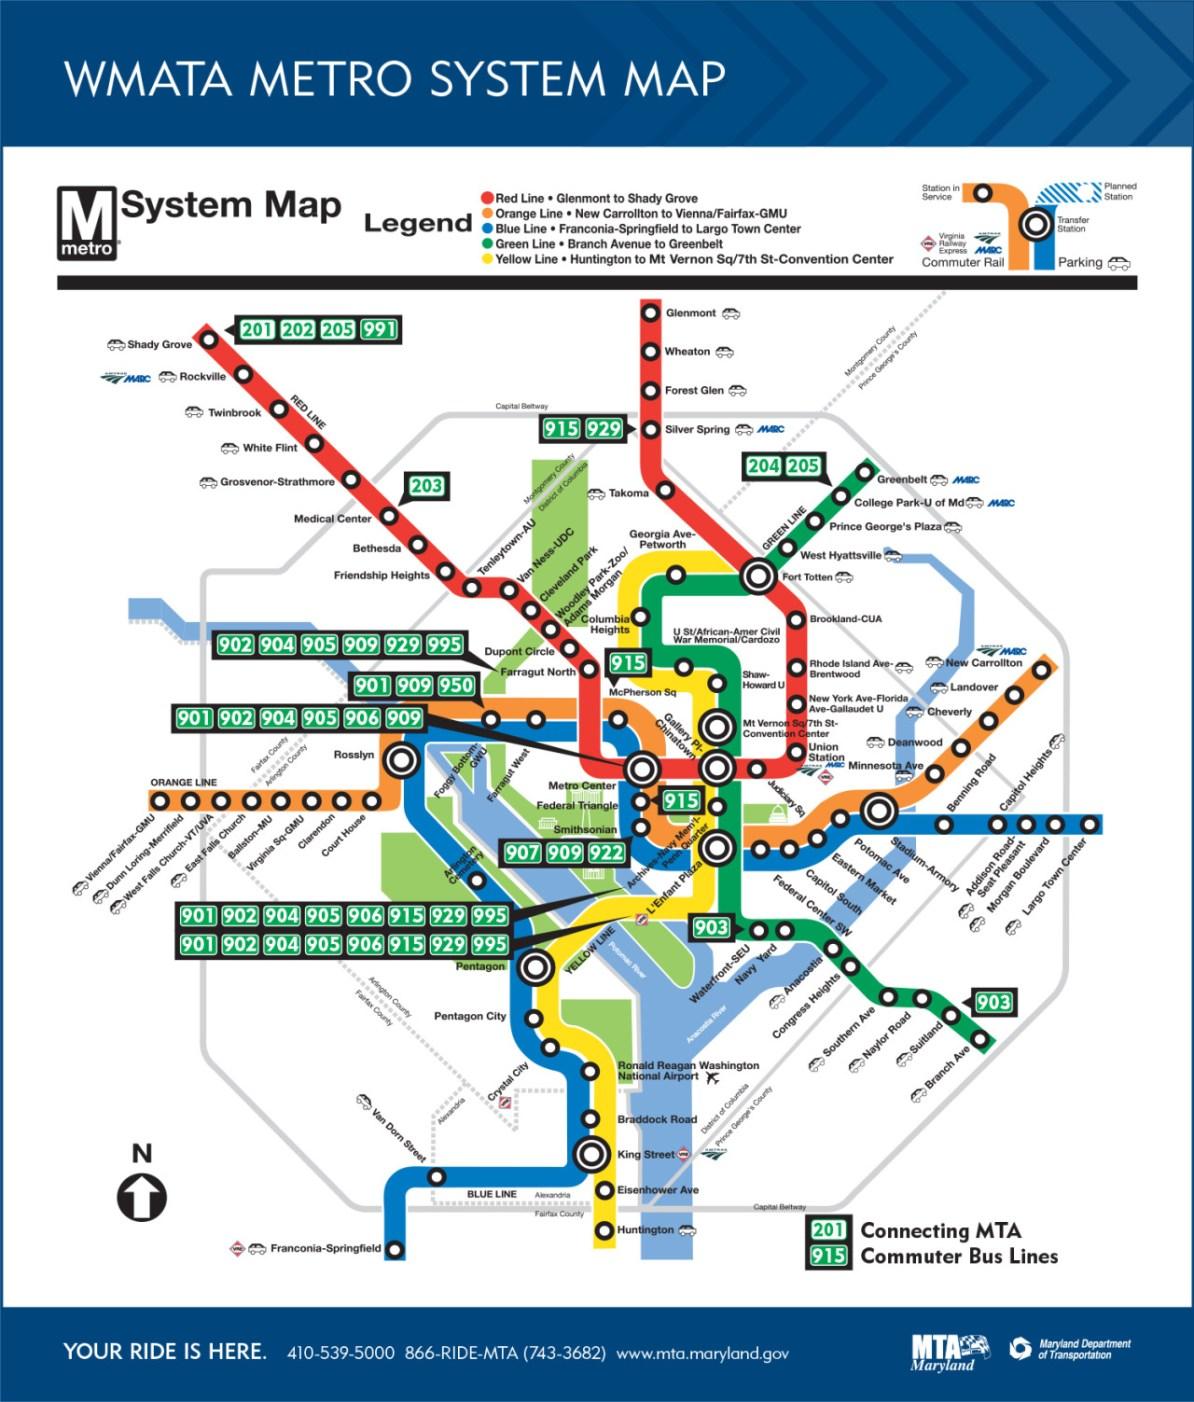 Mta Subway Map Washington Dc.Transit Maps Weird The Maryland Transit Administration S Version